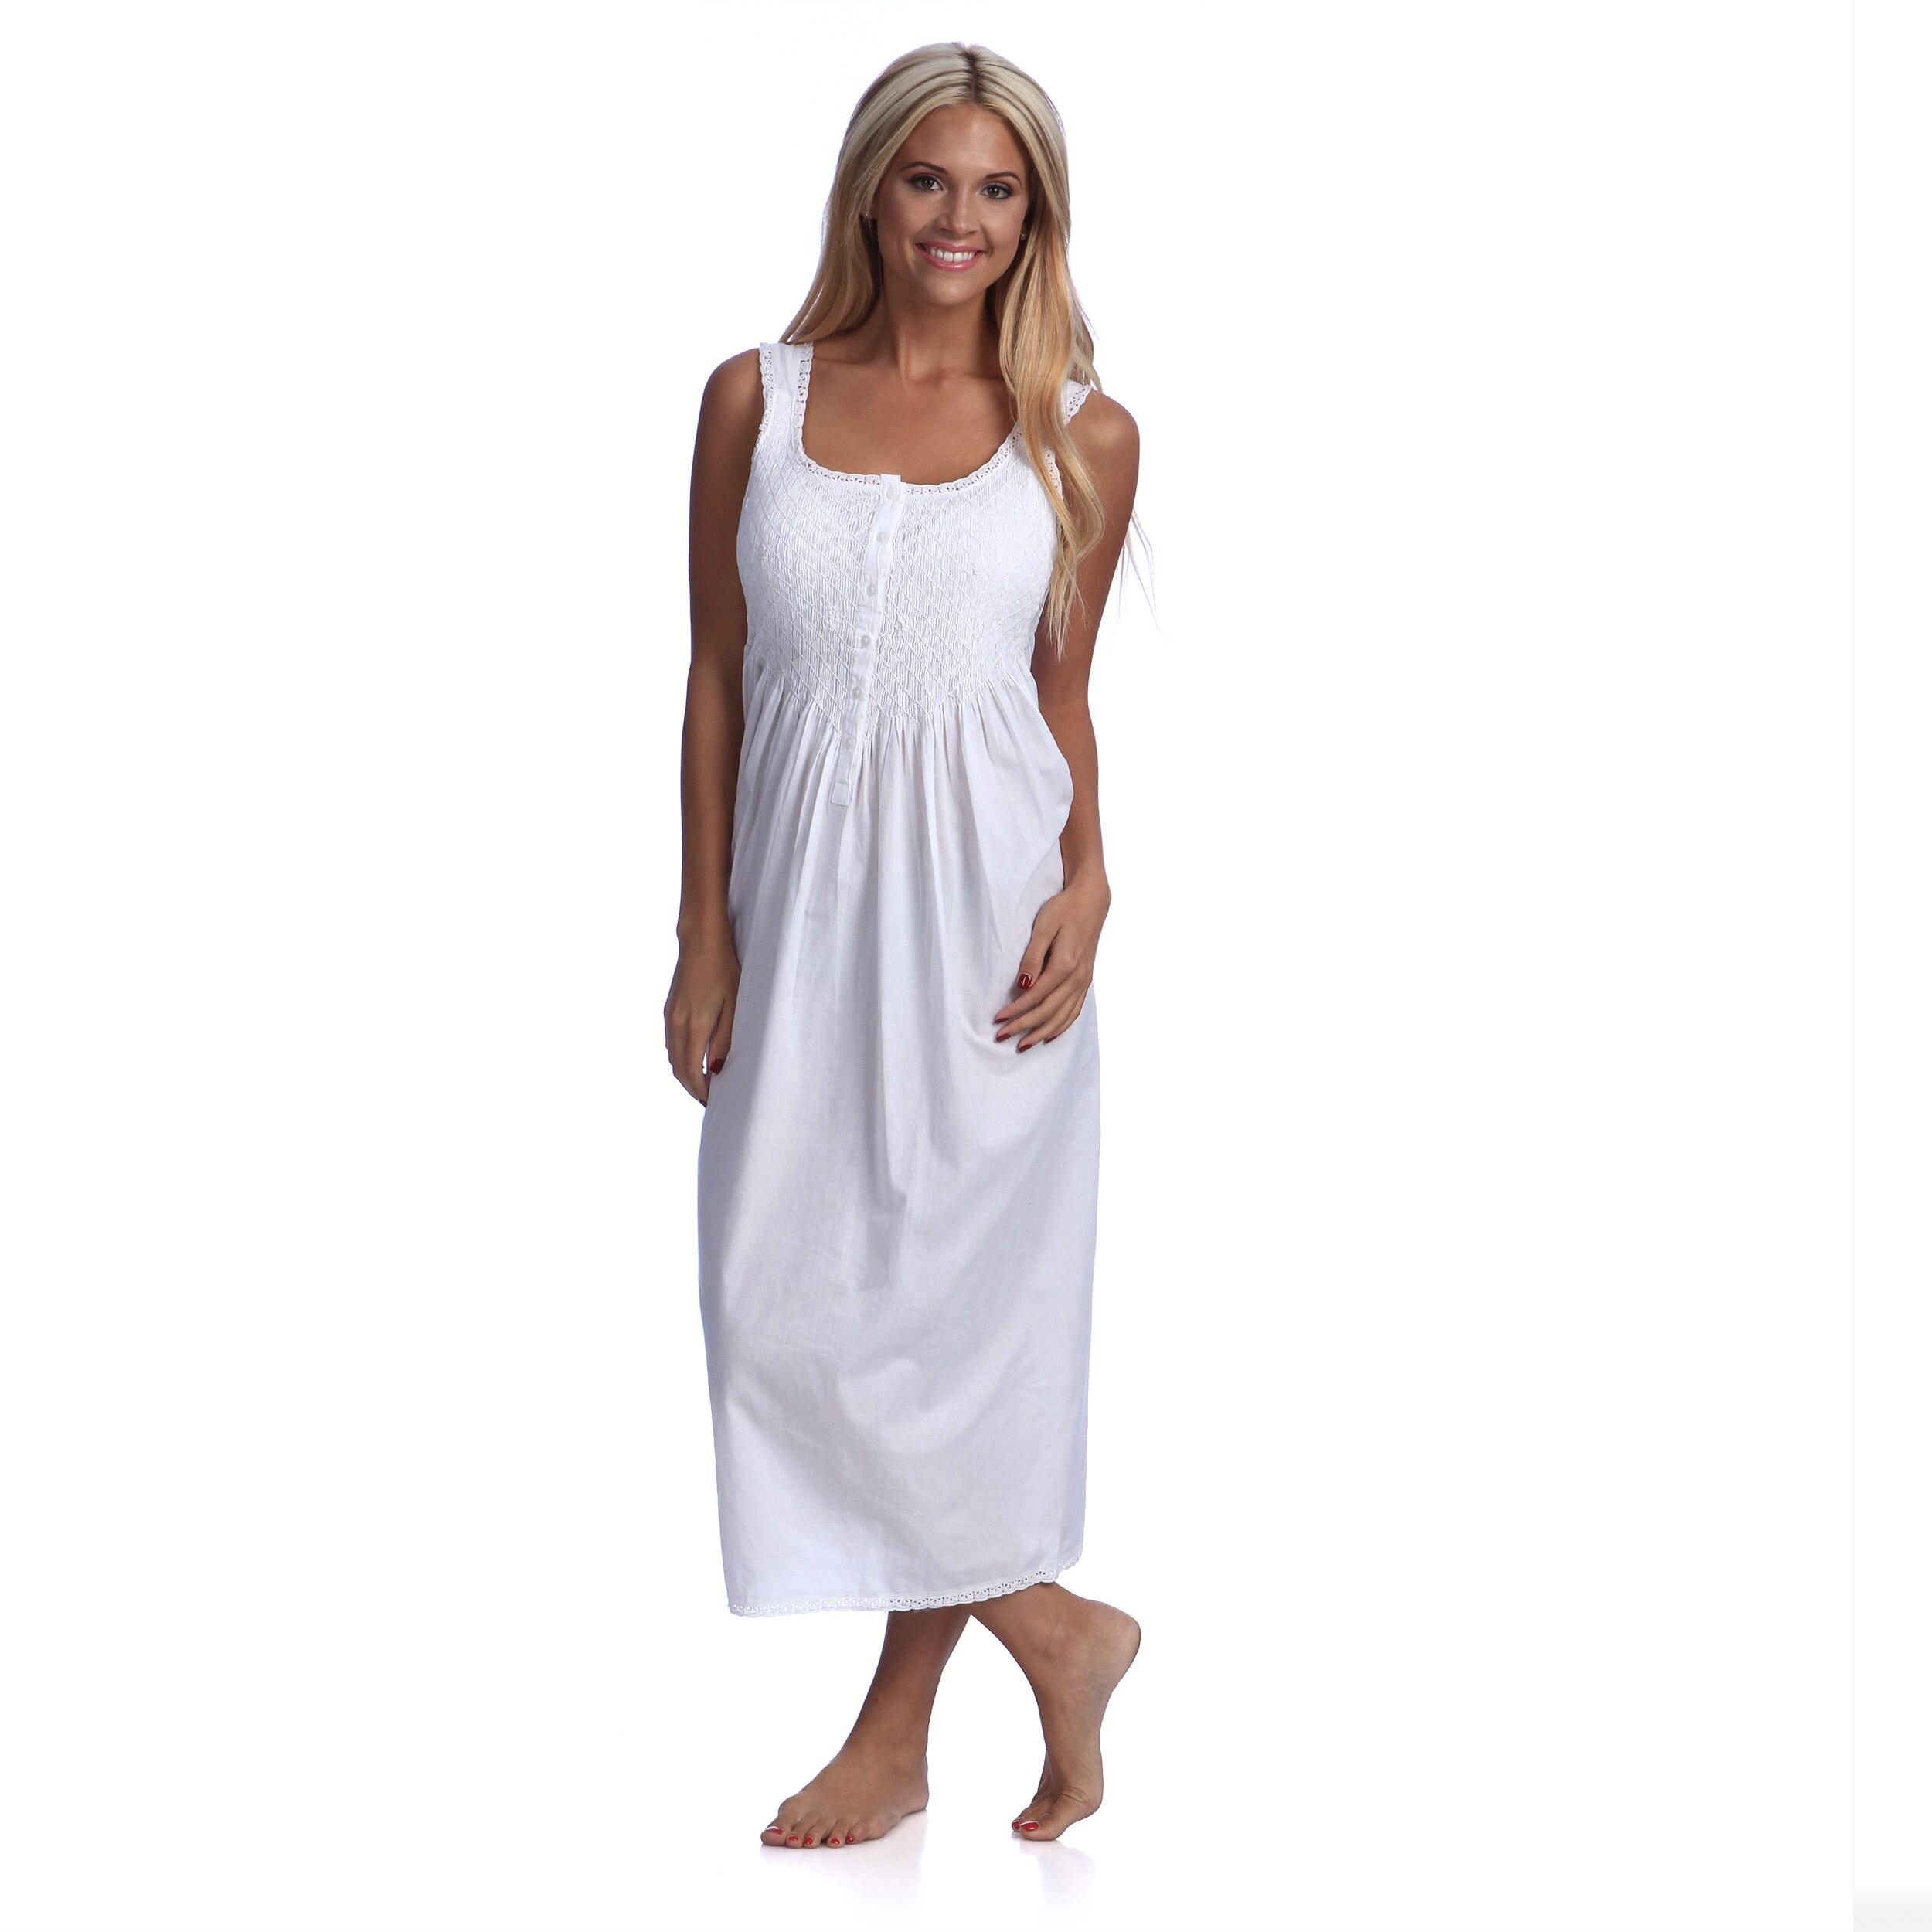 Saro Pure Cotton Full-Length Sleeveless Embroidered Night...